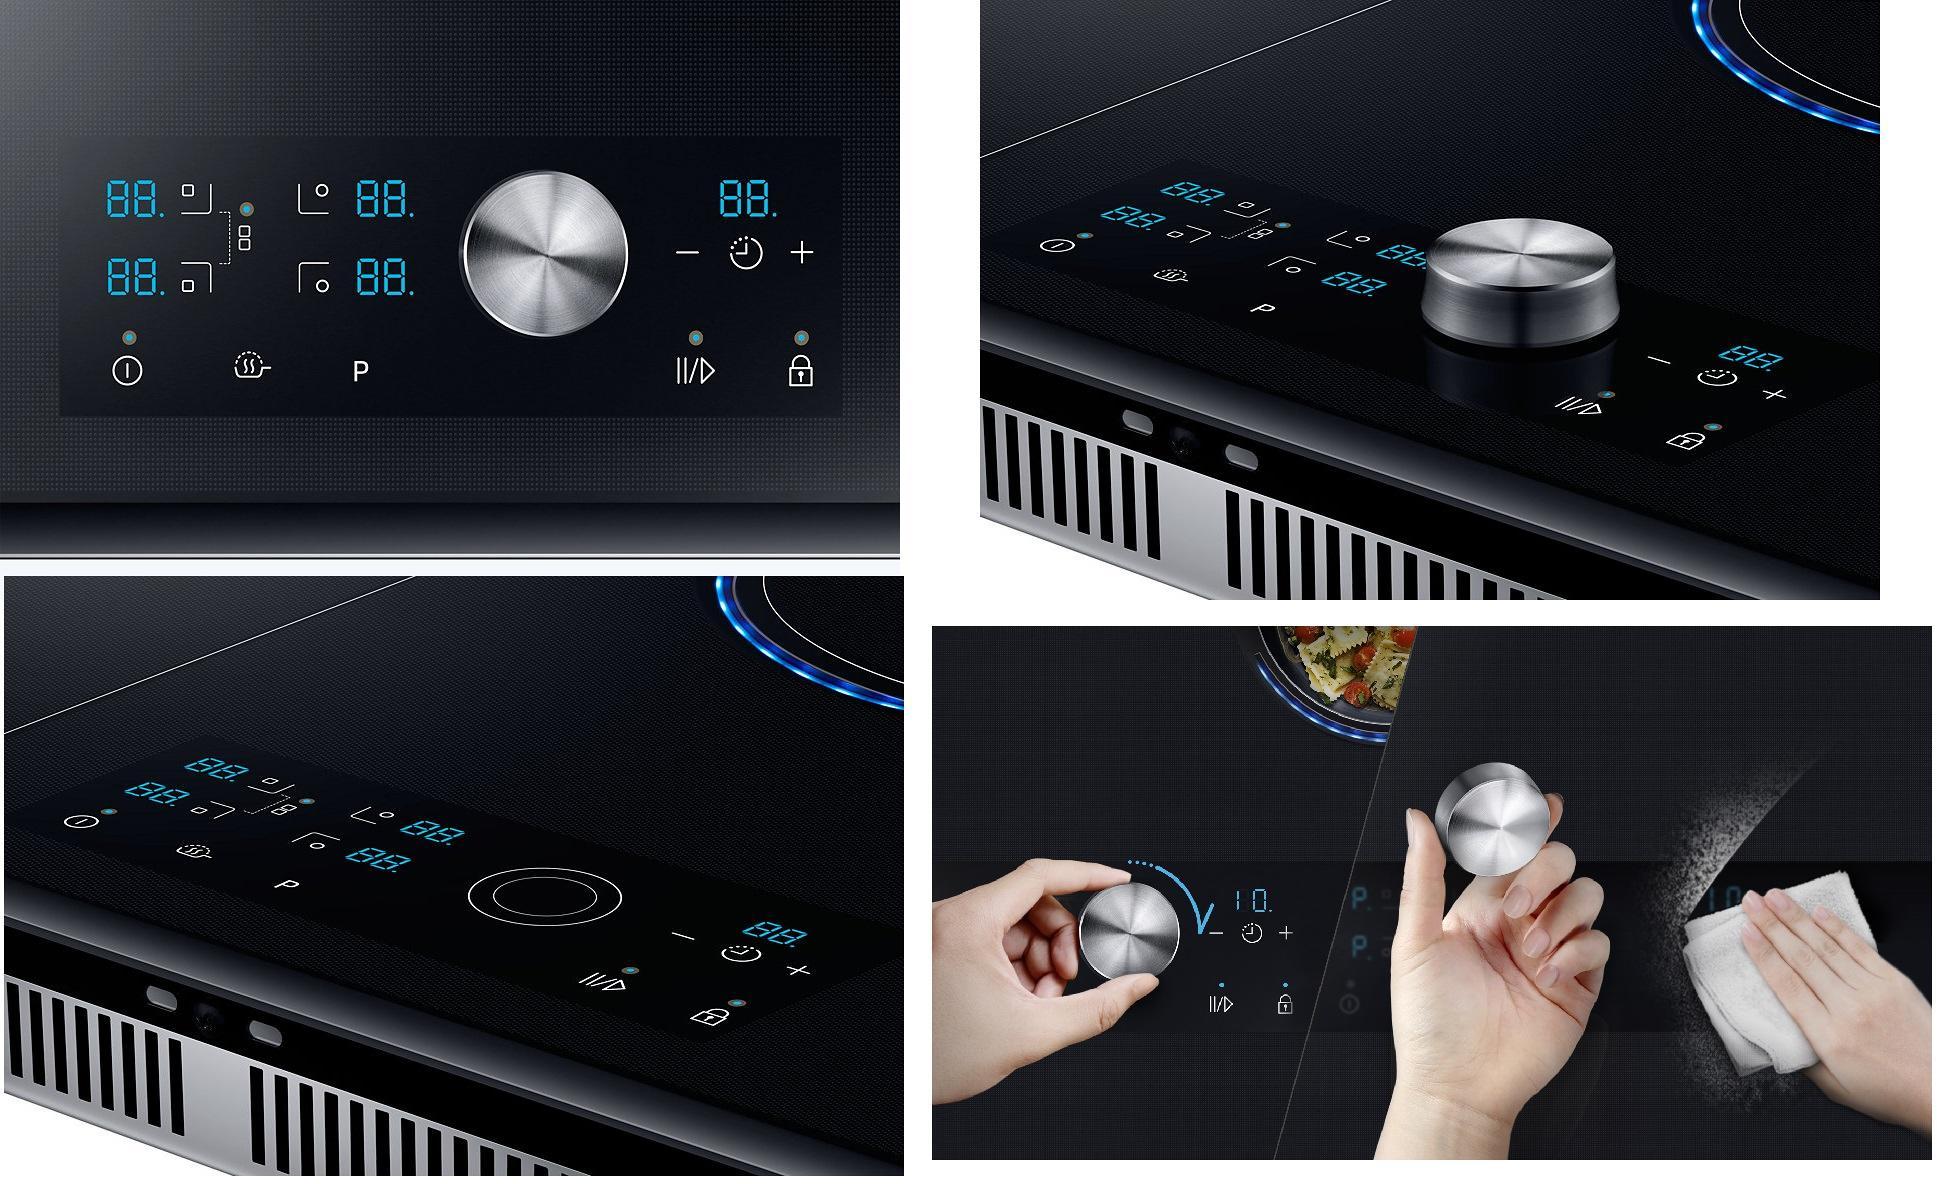 Samsung Nz84j9770ek Autarkes Induktions Kochfeld Glaskeramik